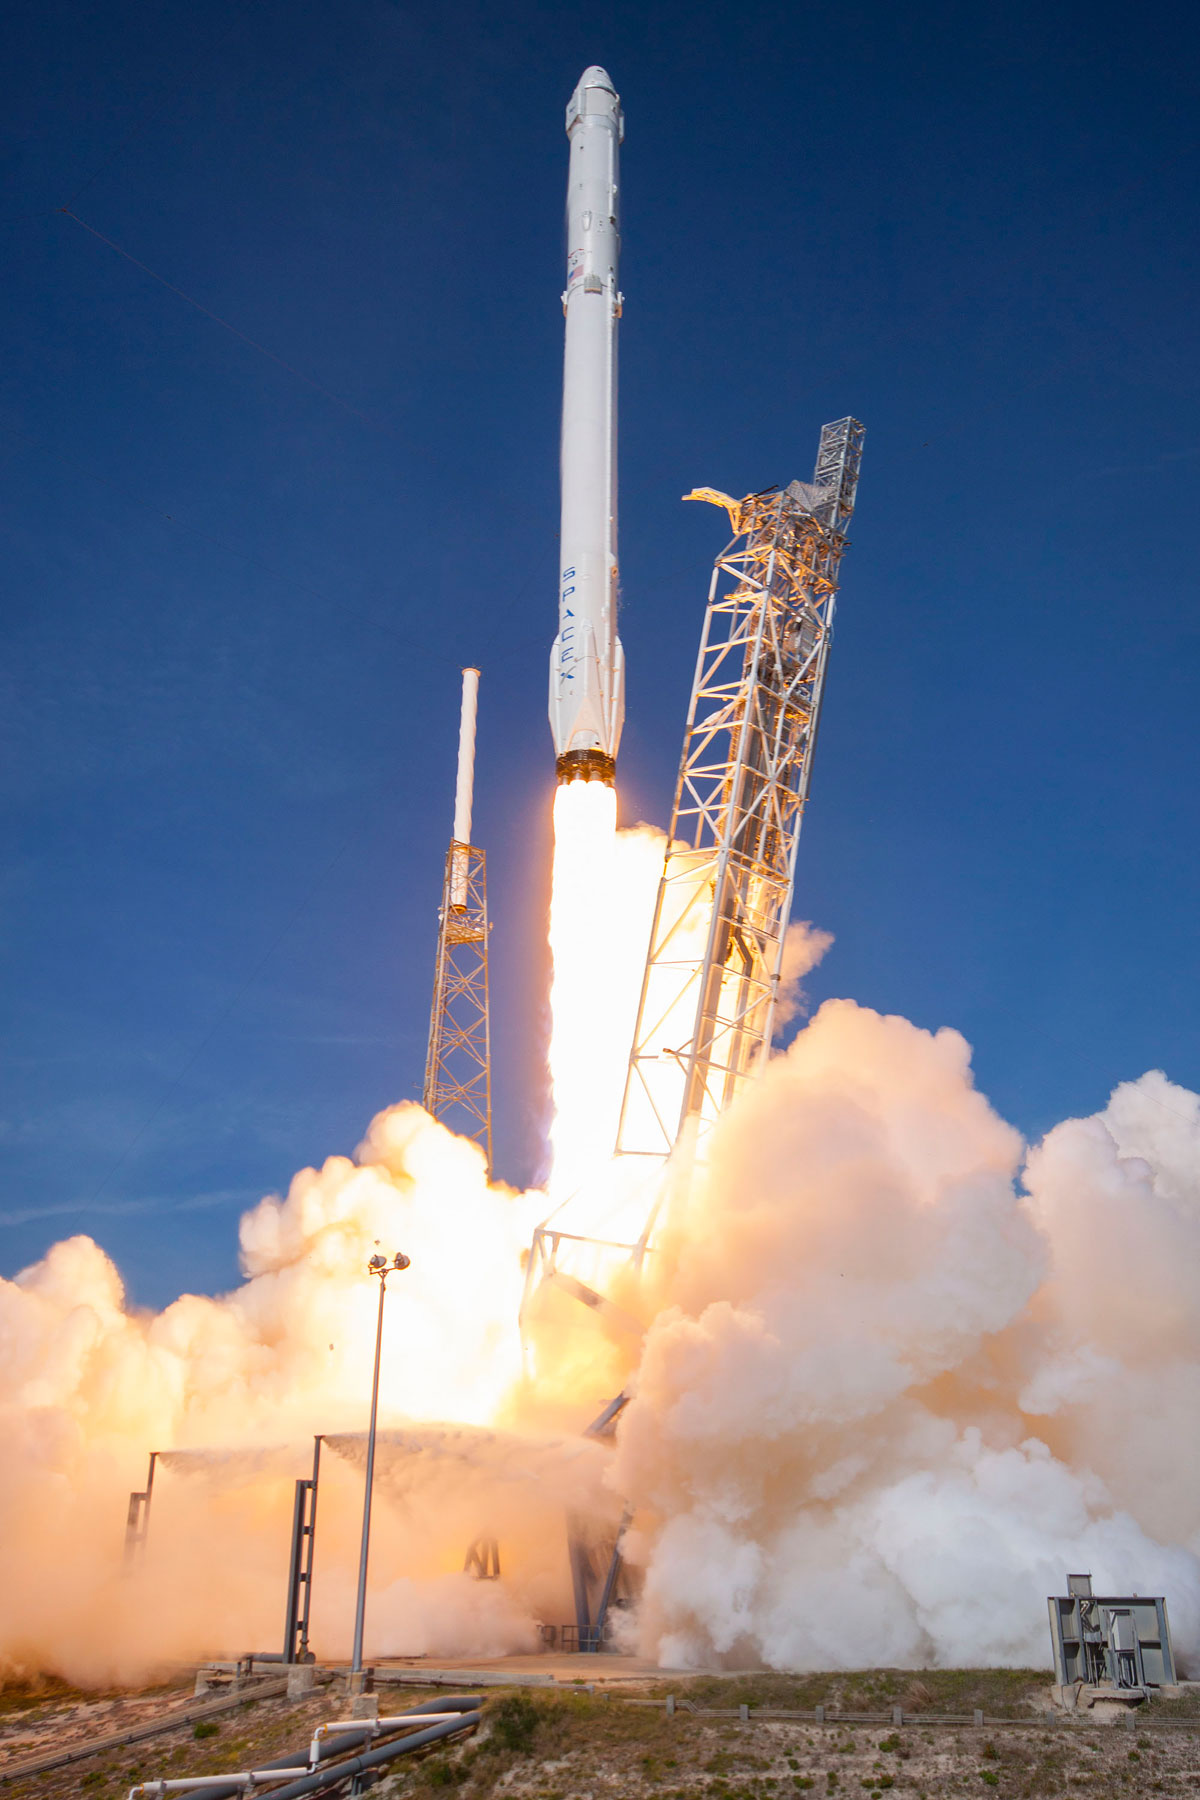 spacex reusable rocket splash down - photo #22